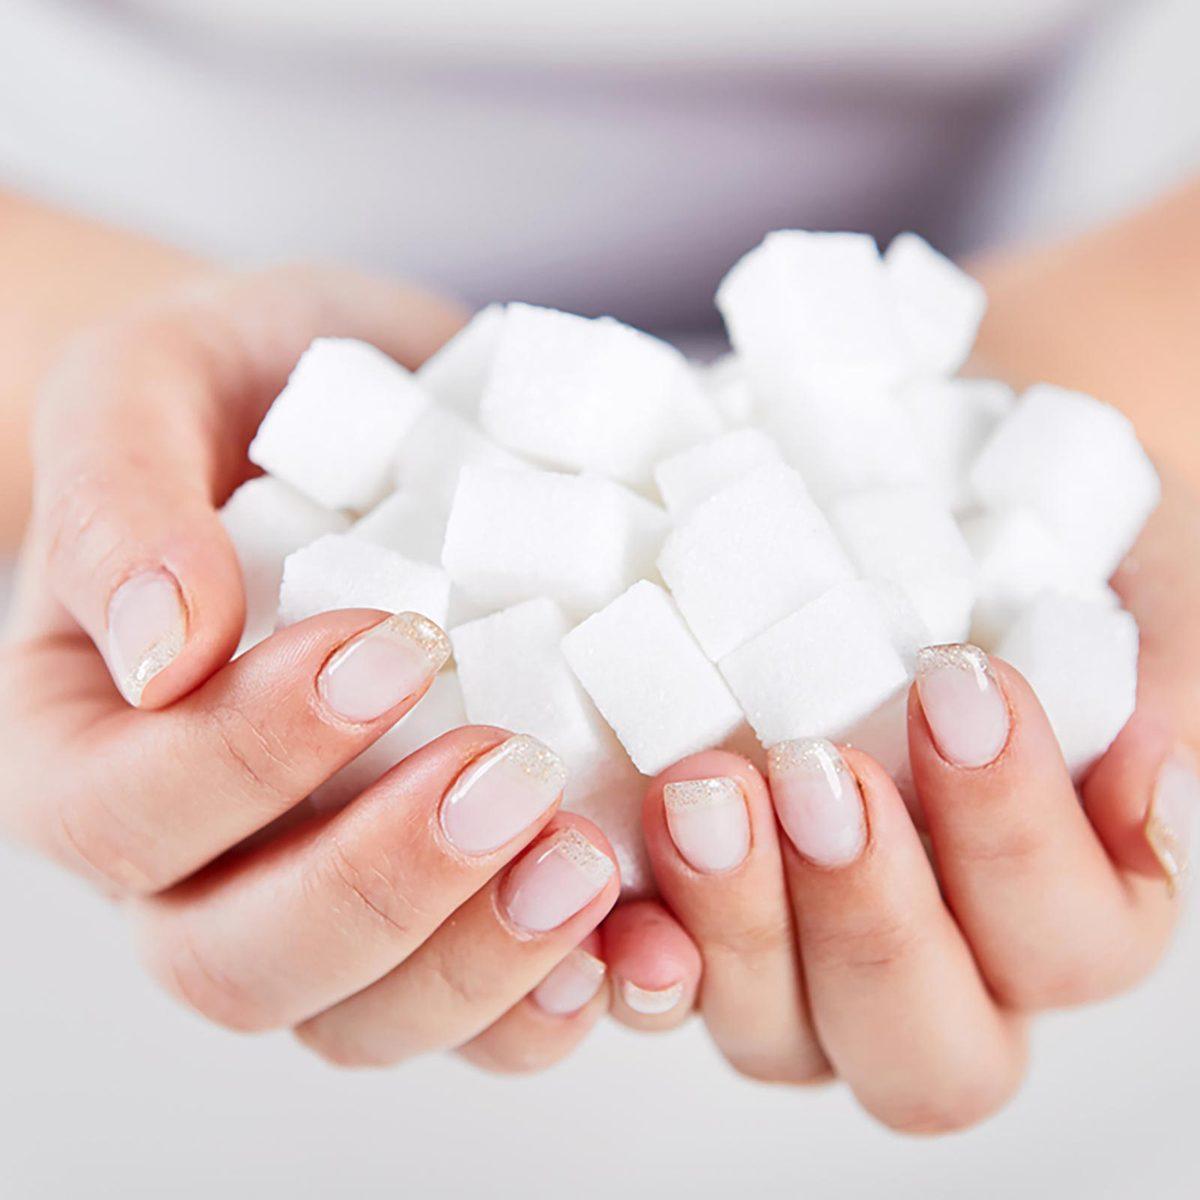 Woman holding sugar cubes